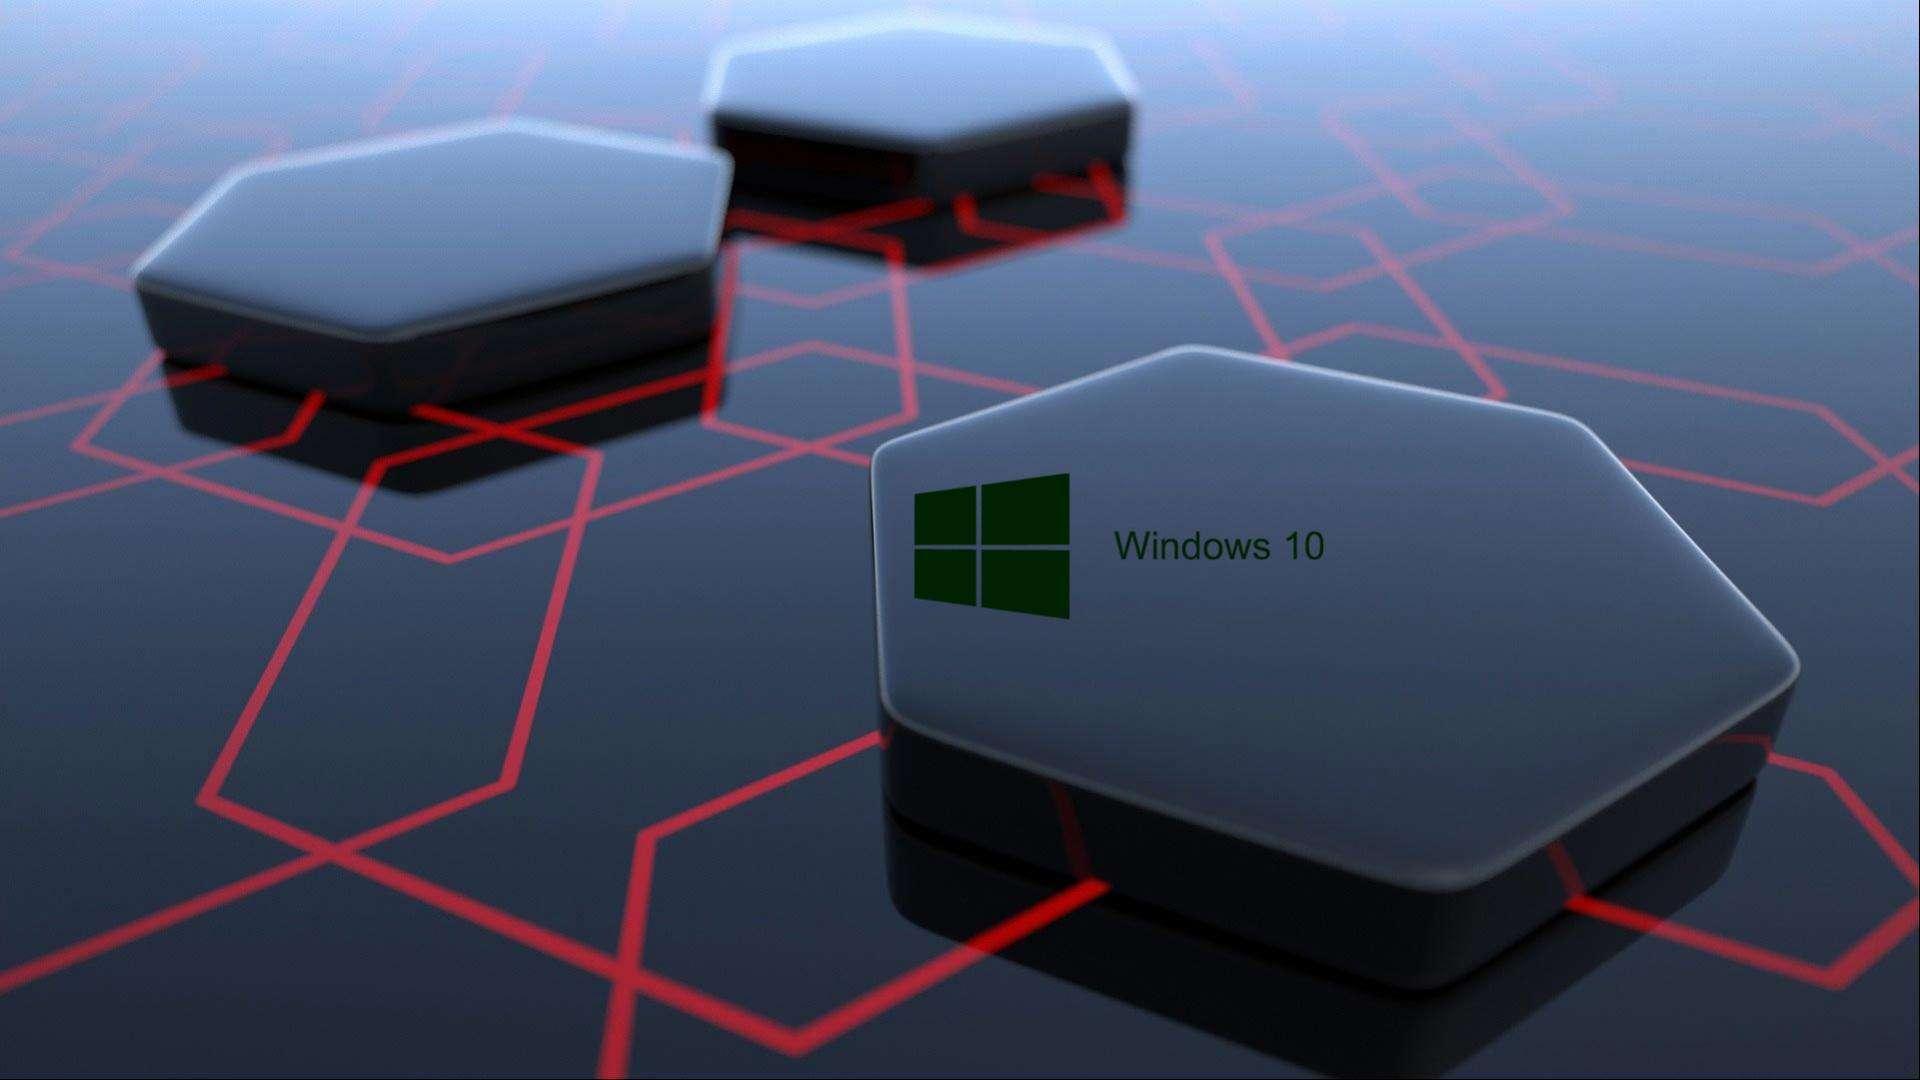 Wallpaper Windows 10 Wallpaper Hd 1080p Upload at July 31 2015 by 1920x1080